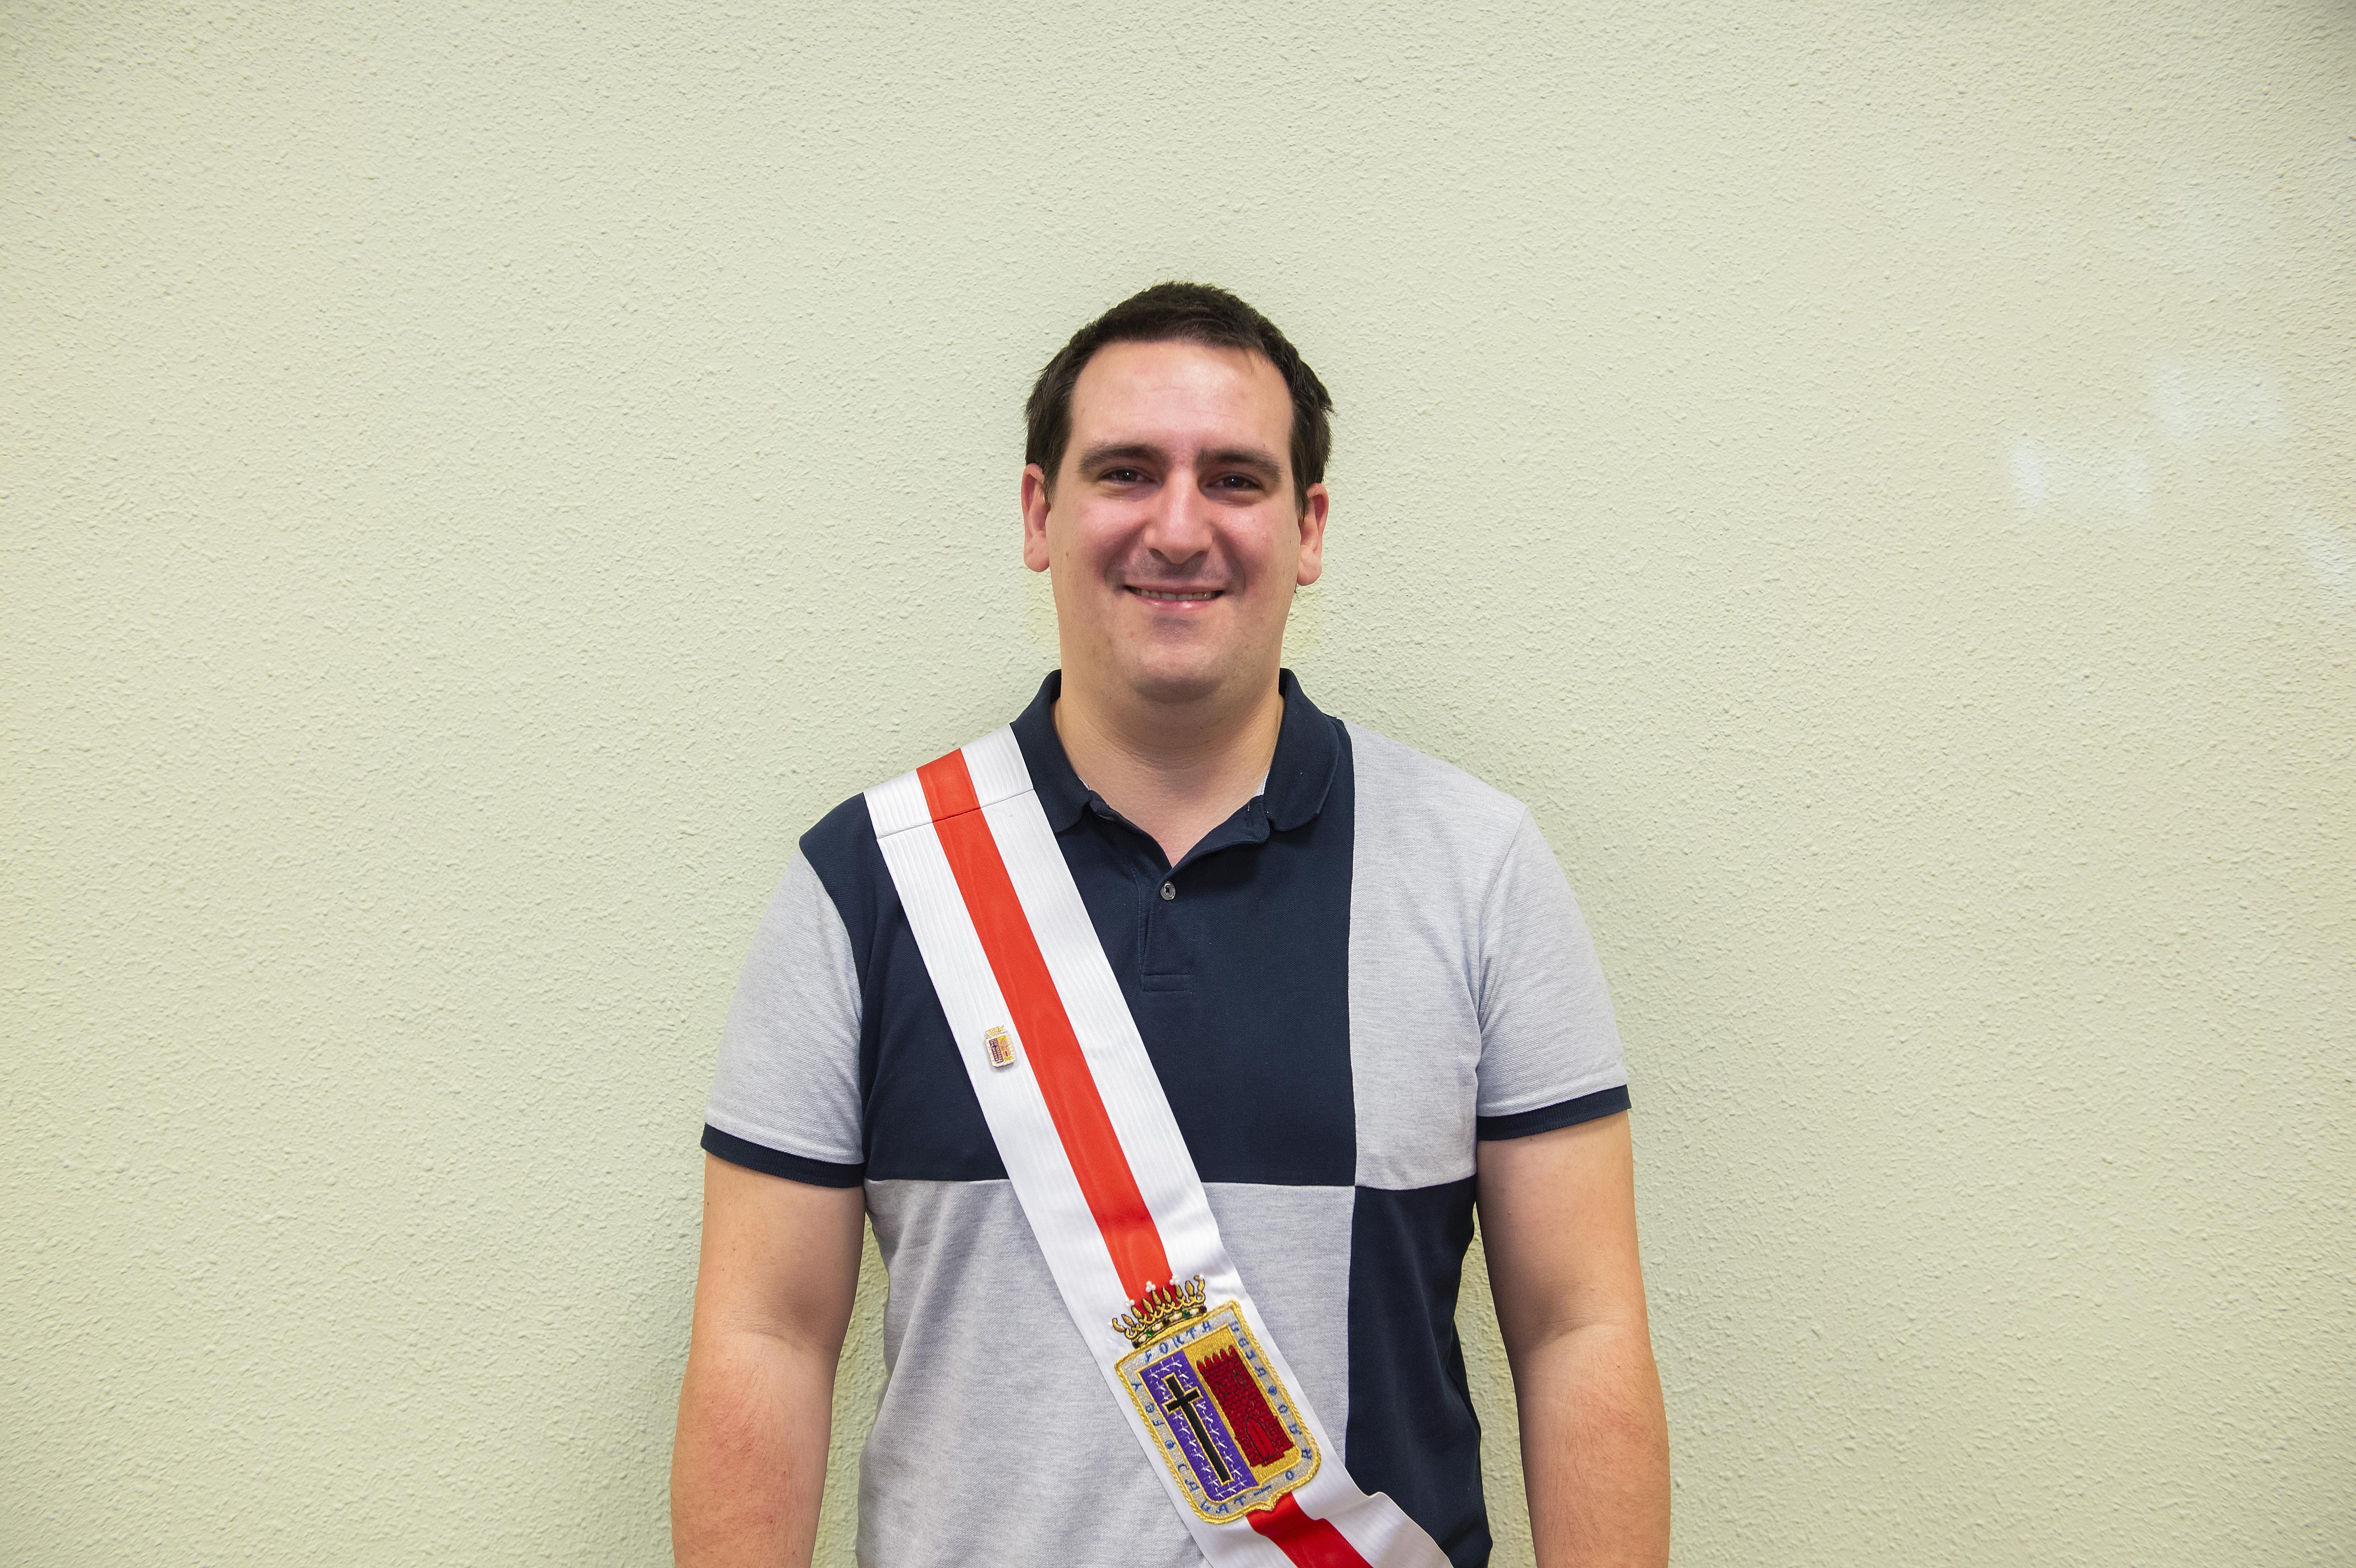 Jorge Rosel Vallejo